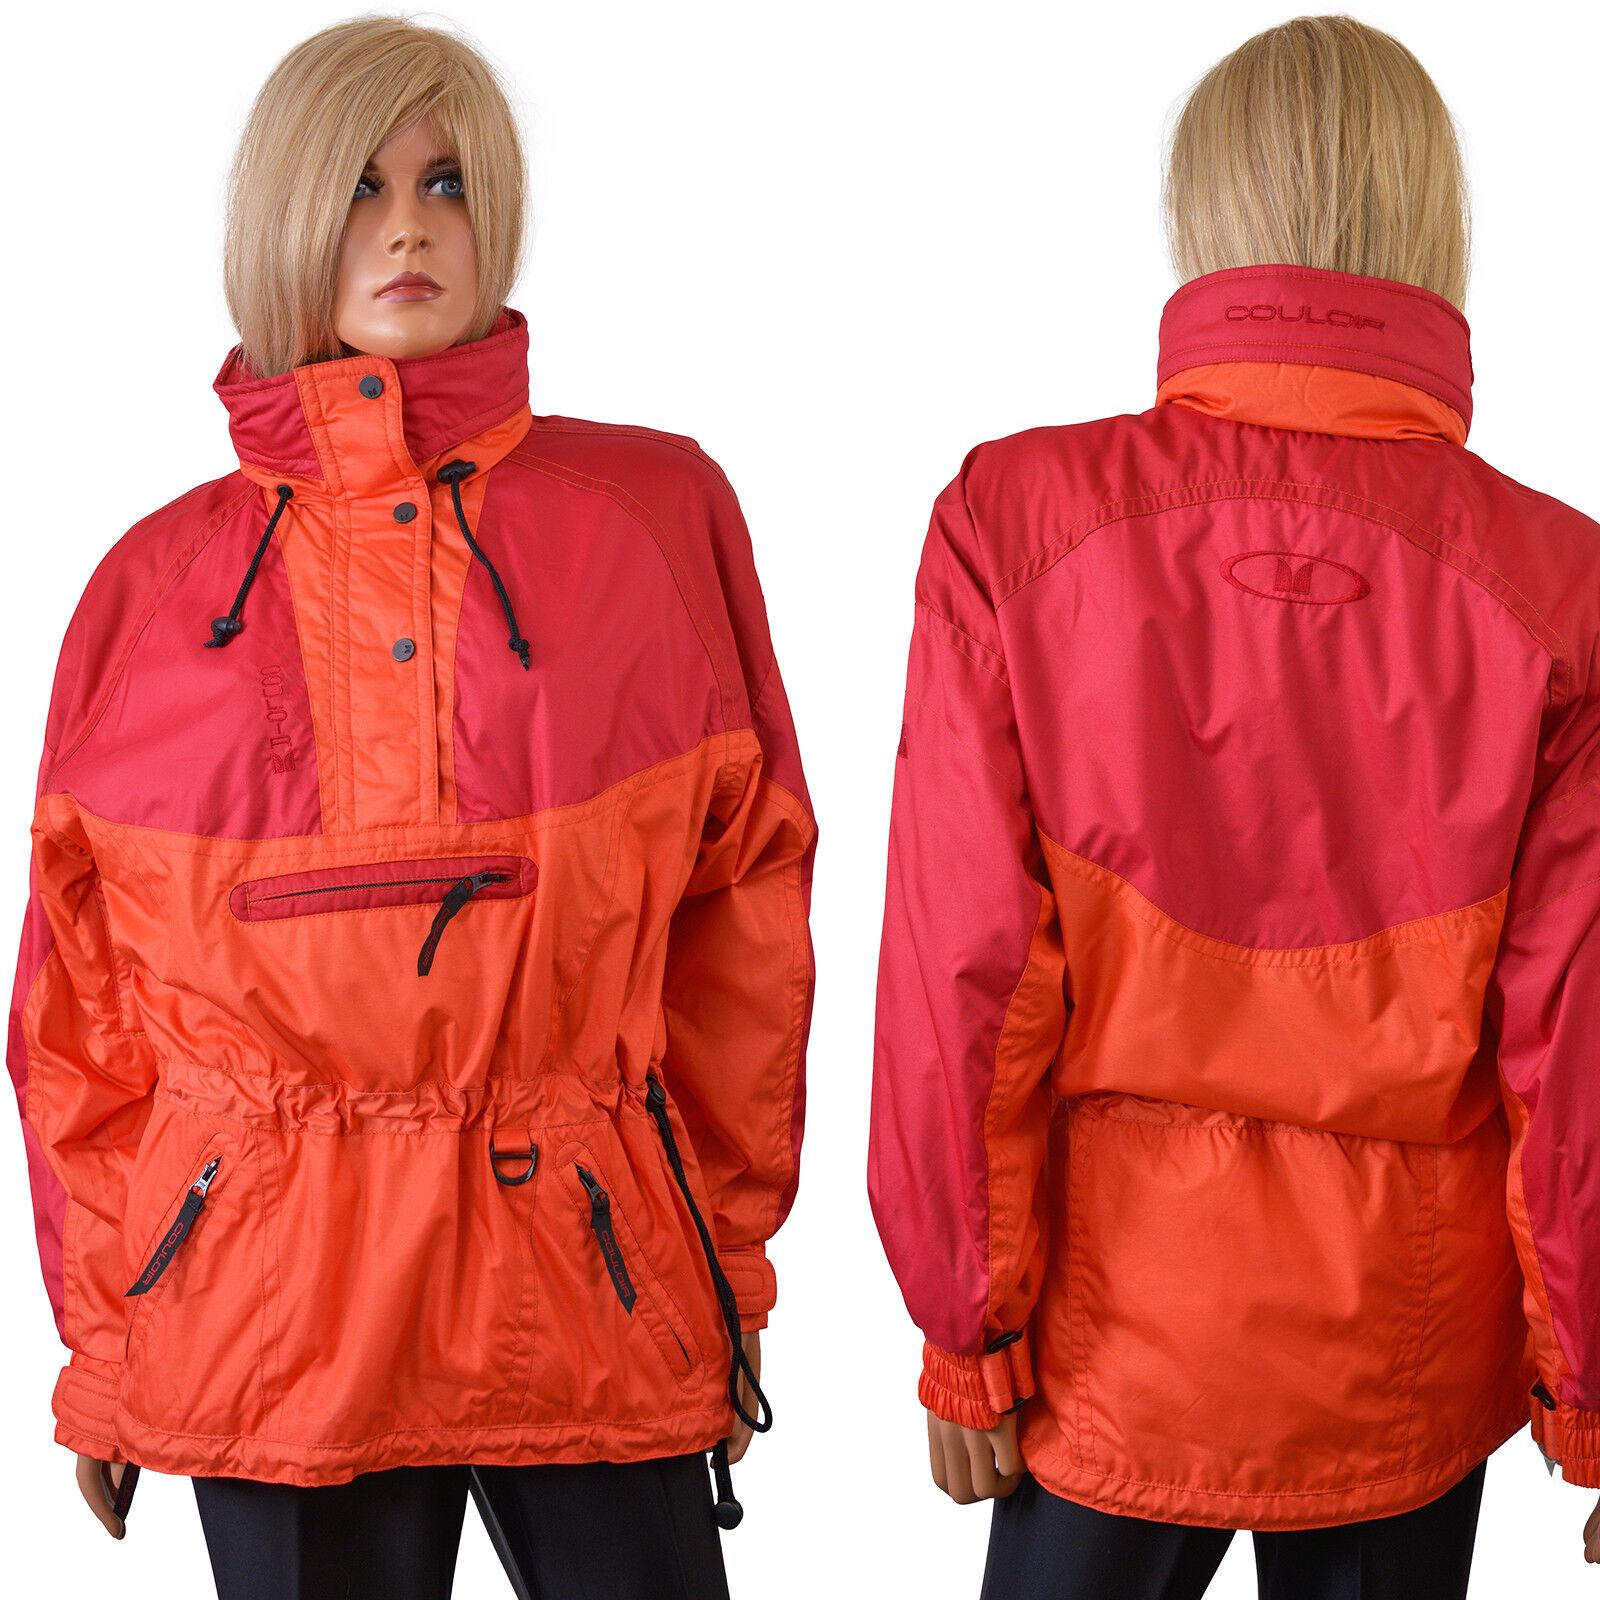 Vintage Couloir SHELL JACKET Technical Ski Coat Womens Orange Colorblock - 8